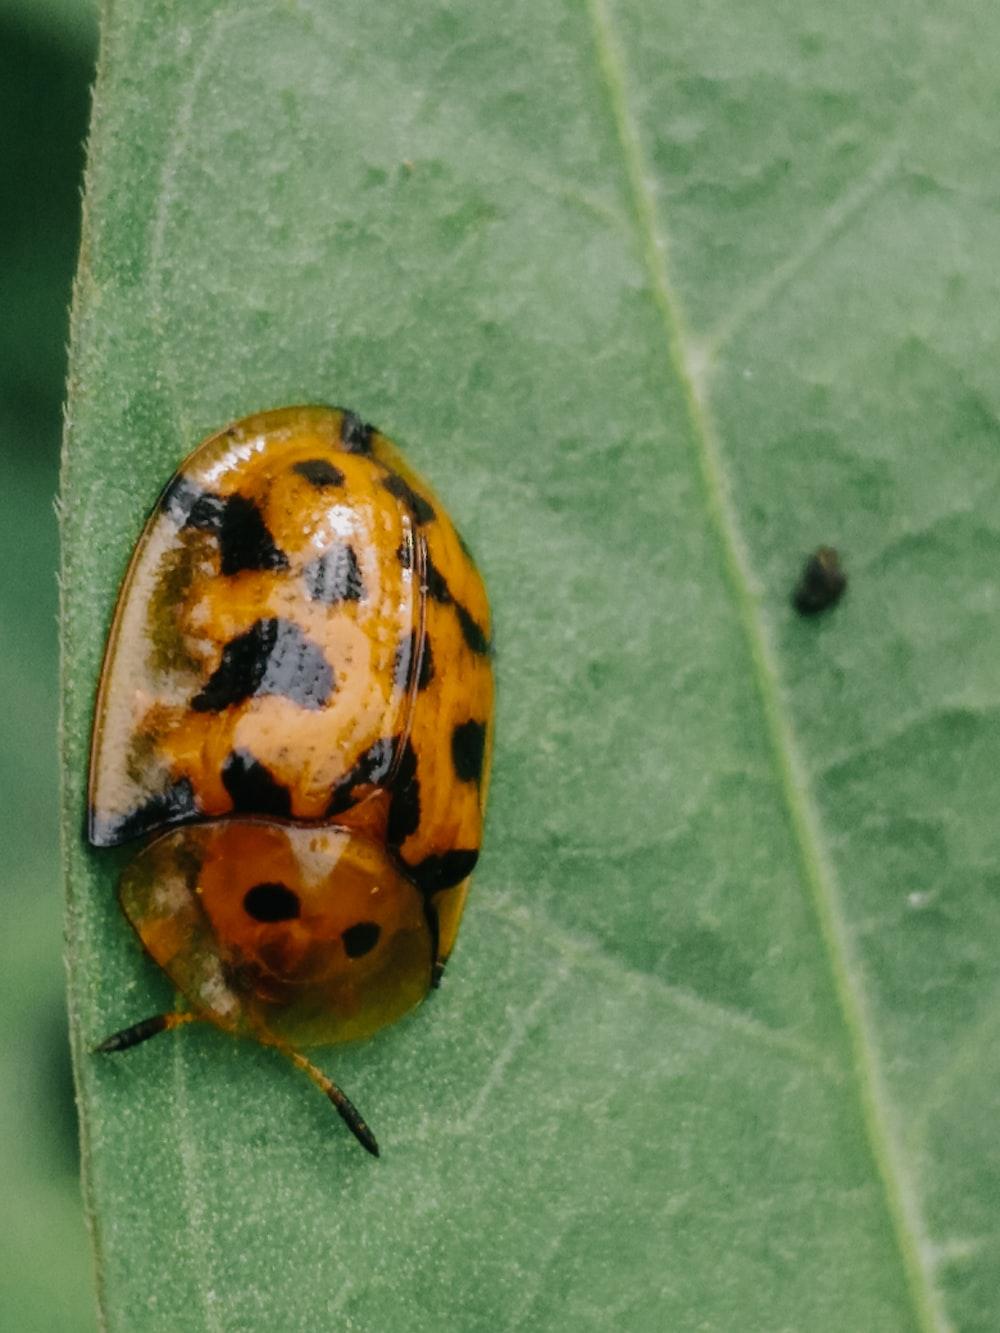 brown and black shield bug